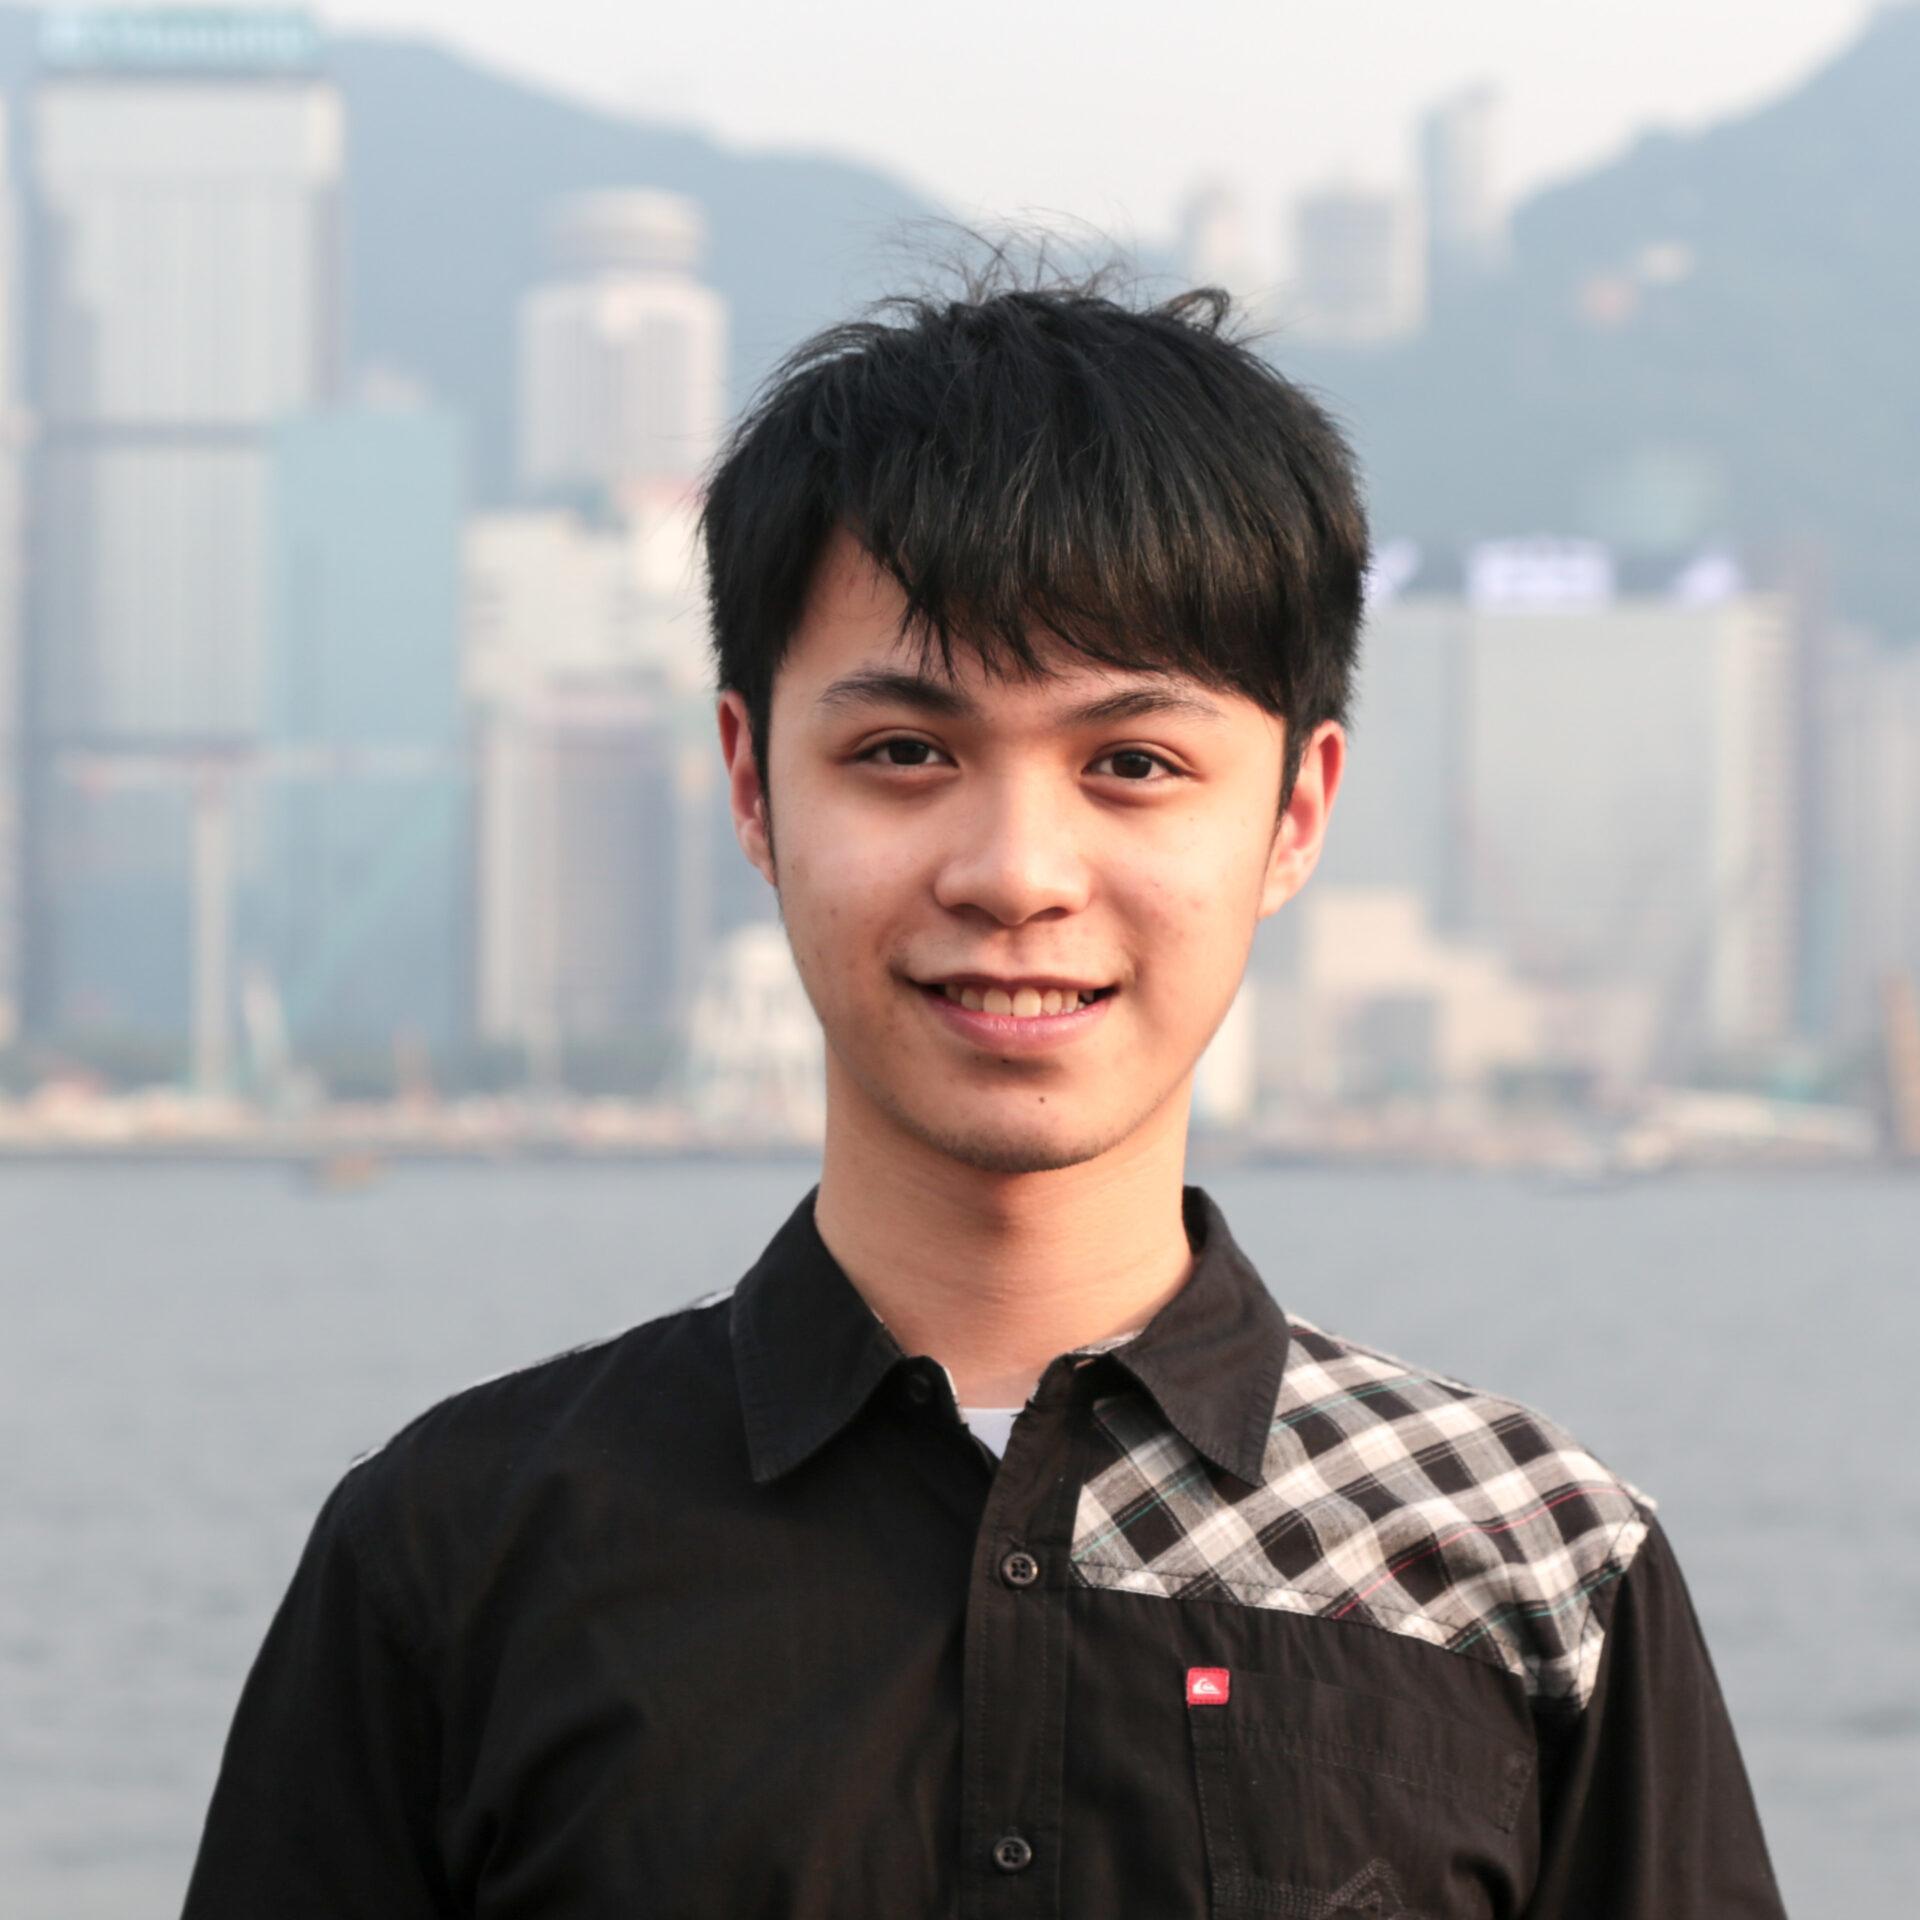 Kenny Lam